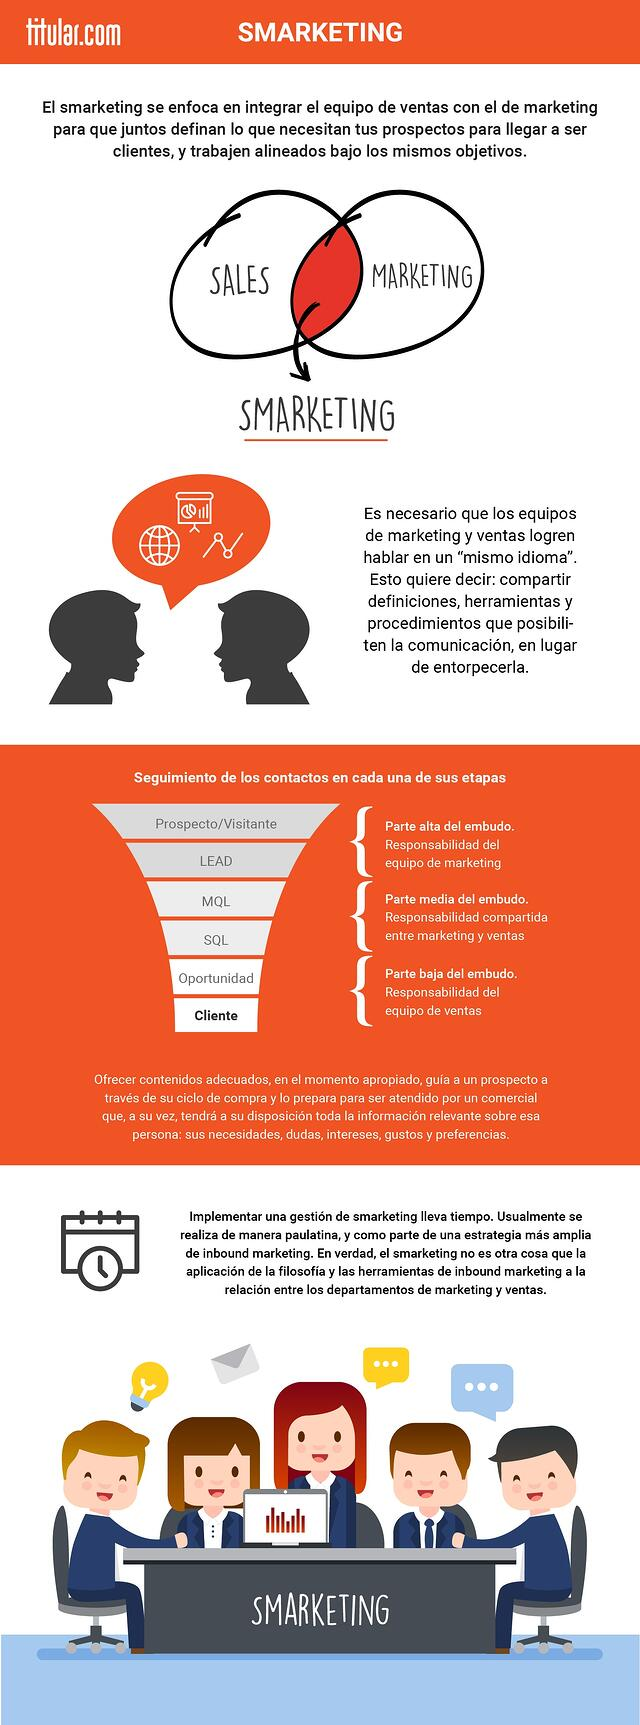 Infografia Smarketing.jpg